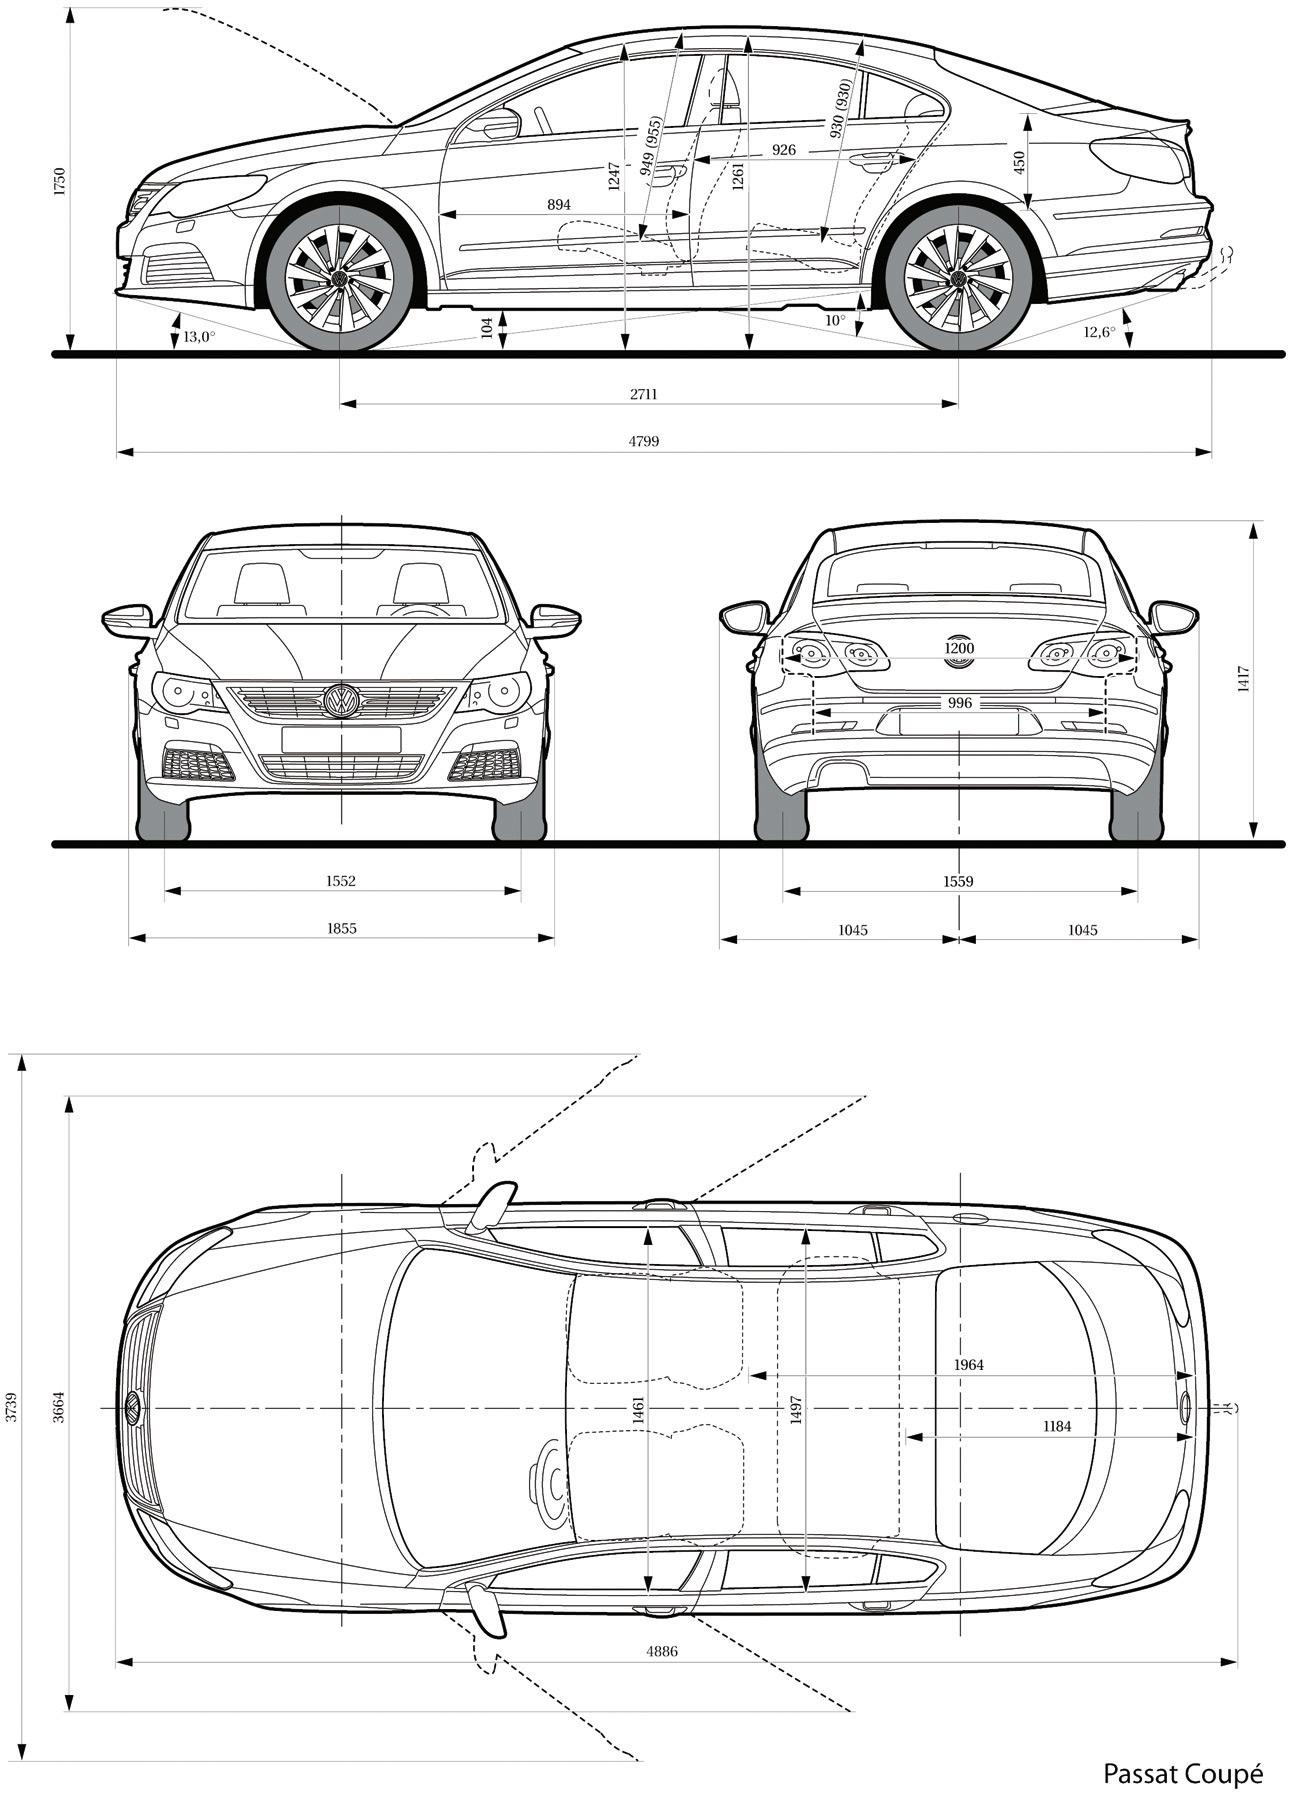 Ausmotive Volkswagen Passat Cc Now In Australian